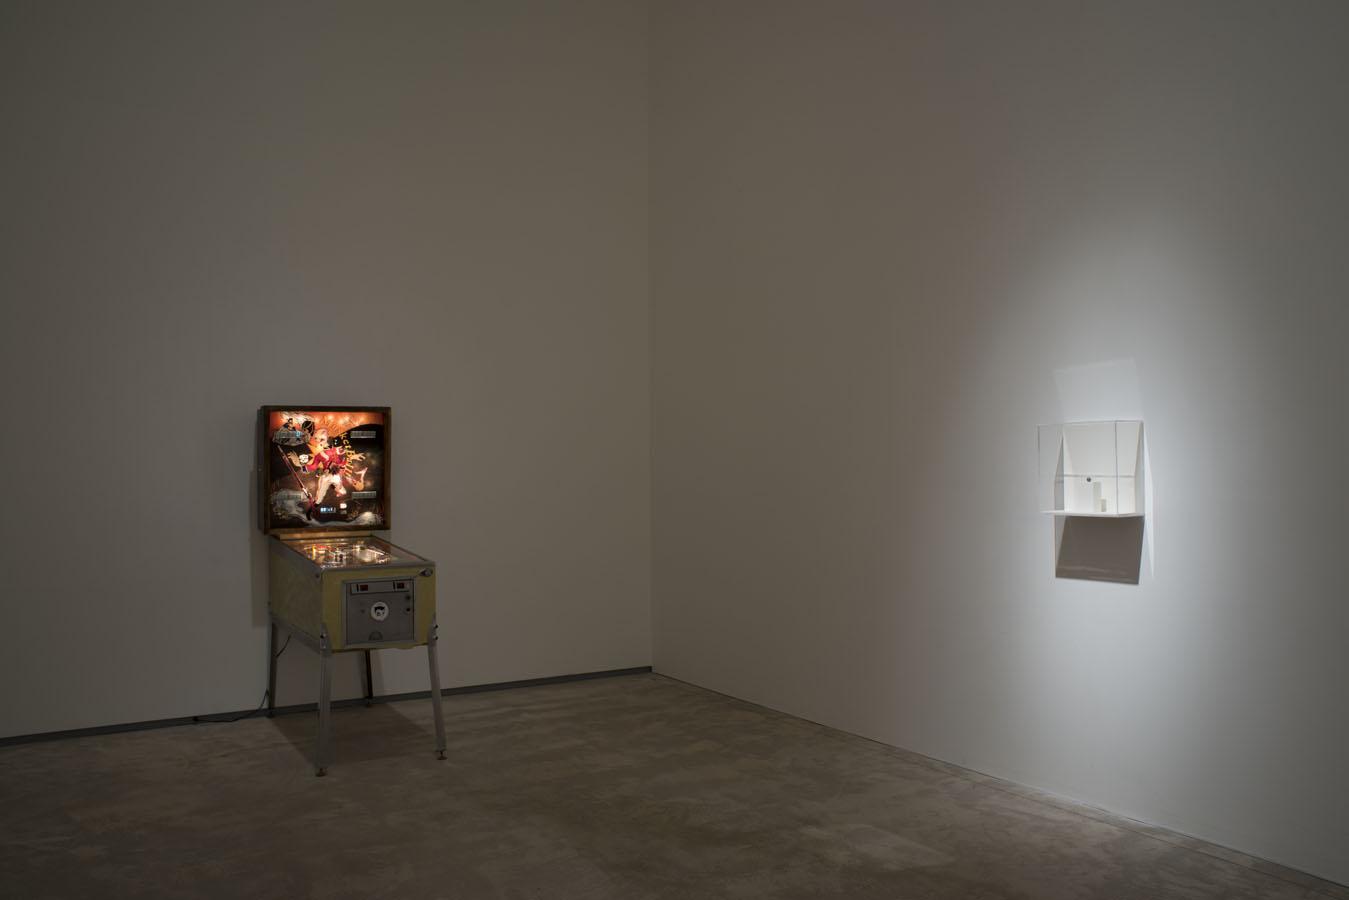 Musketball! , 2012,  Pinball machine, Plexiglas, acrylic paint, vinyl, mp3 trigger and speakers,  178 x 72 x 136,  Replica musket ball,  1.3 cm dia.